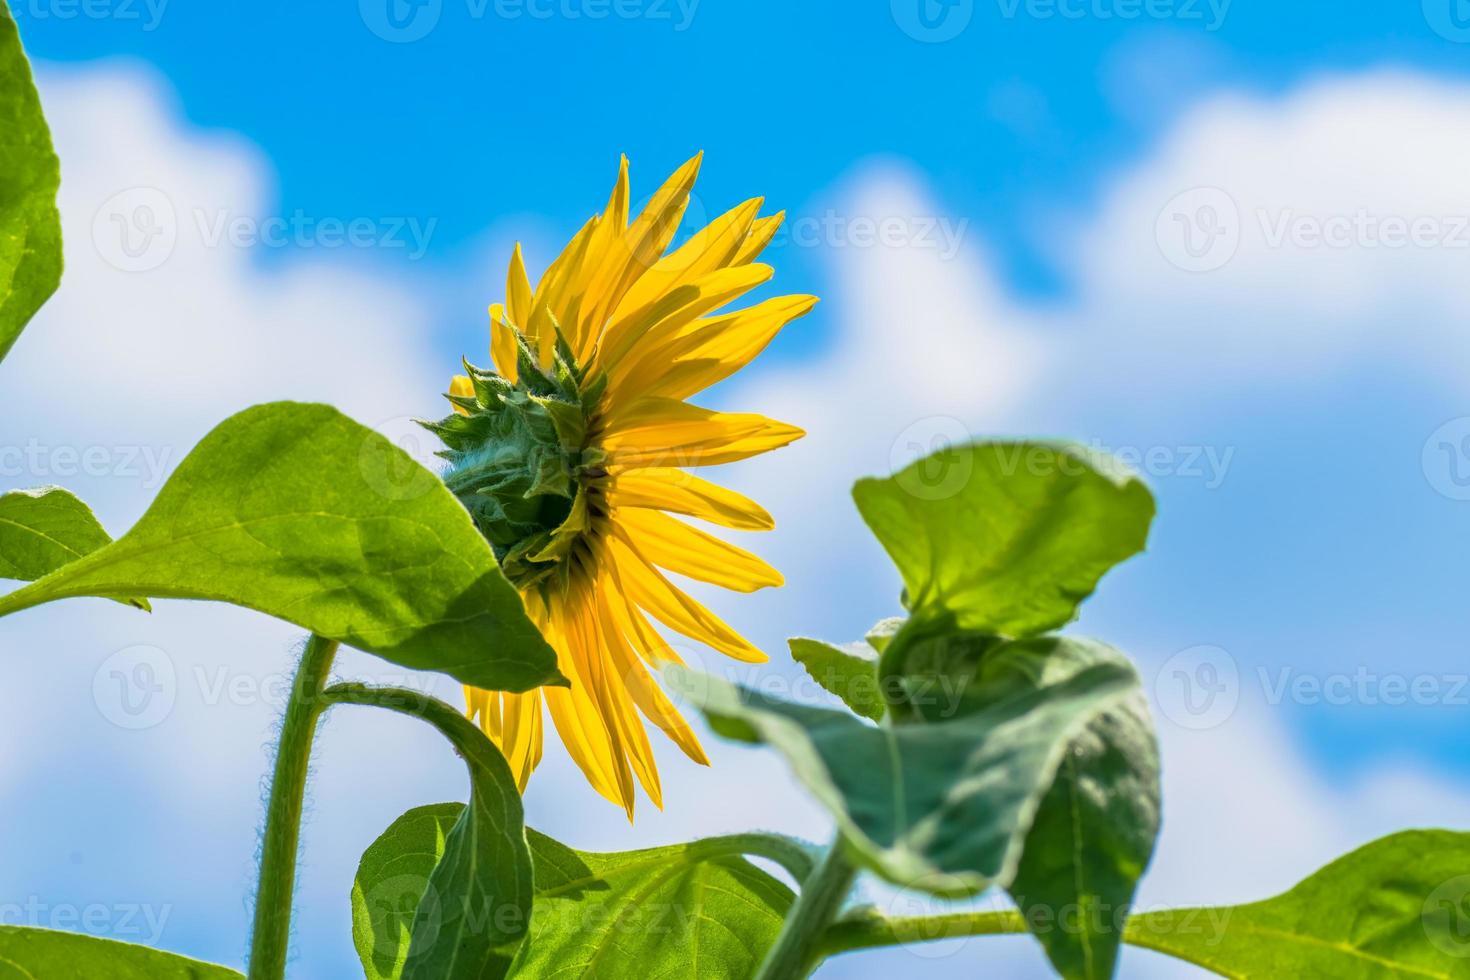 cielo blu e girasole in estate foto